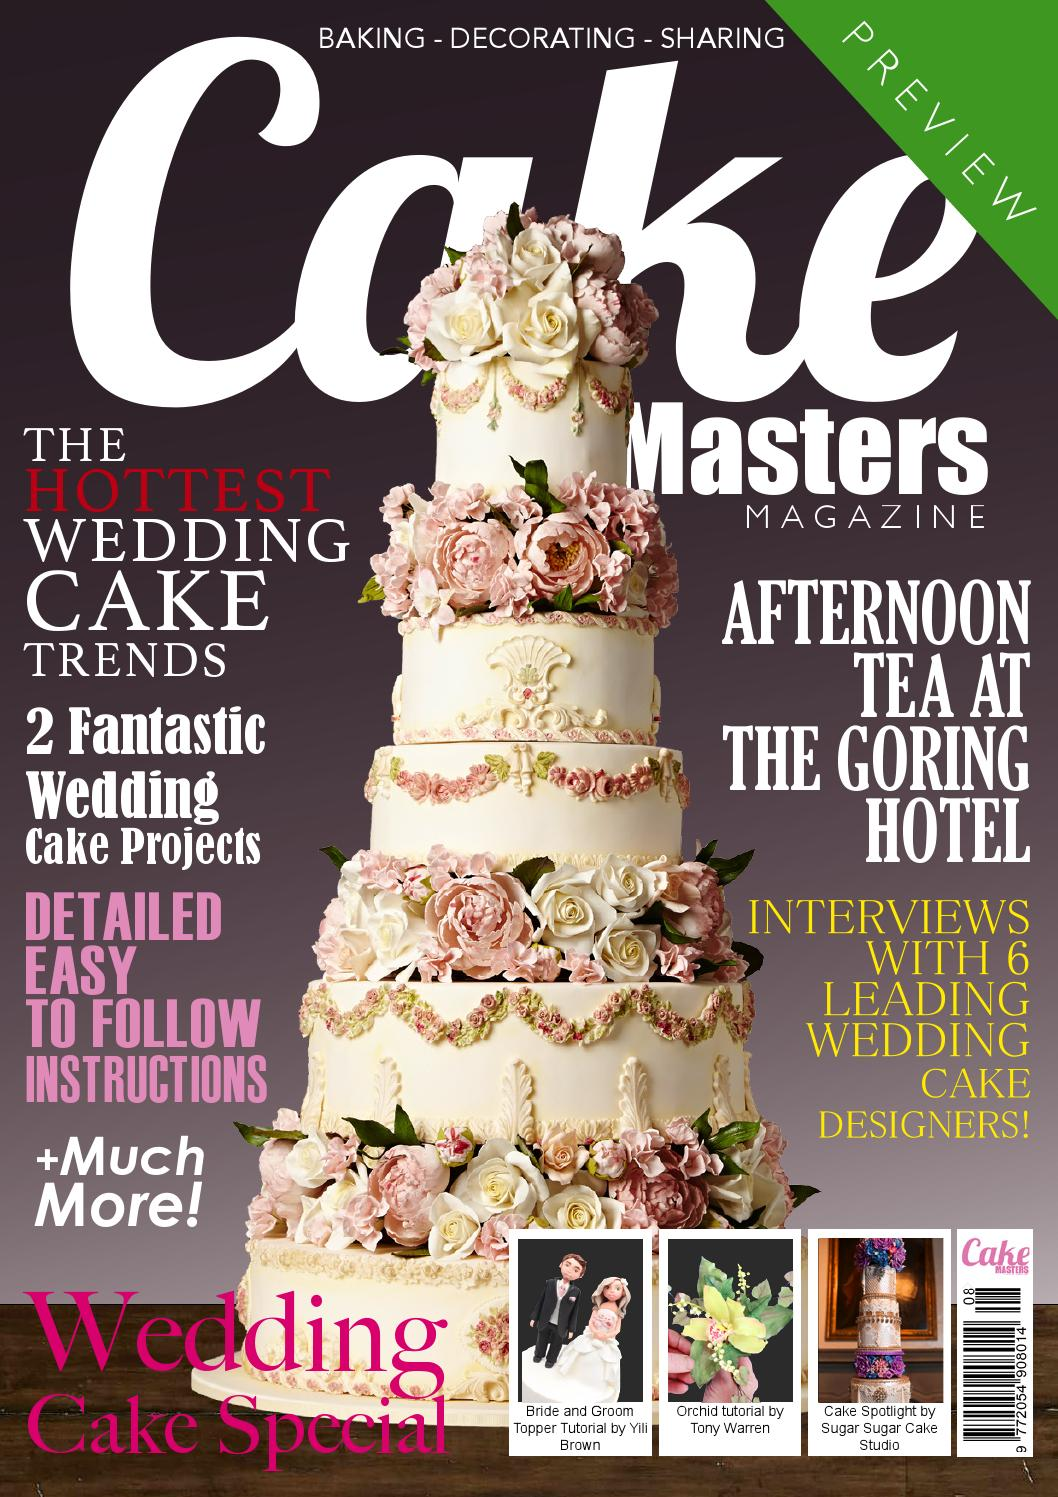 Modern Wedding Cakes Magazine 2013/14 - ON SALE NOW